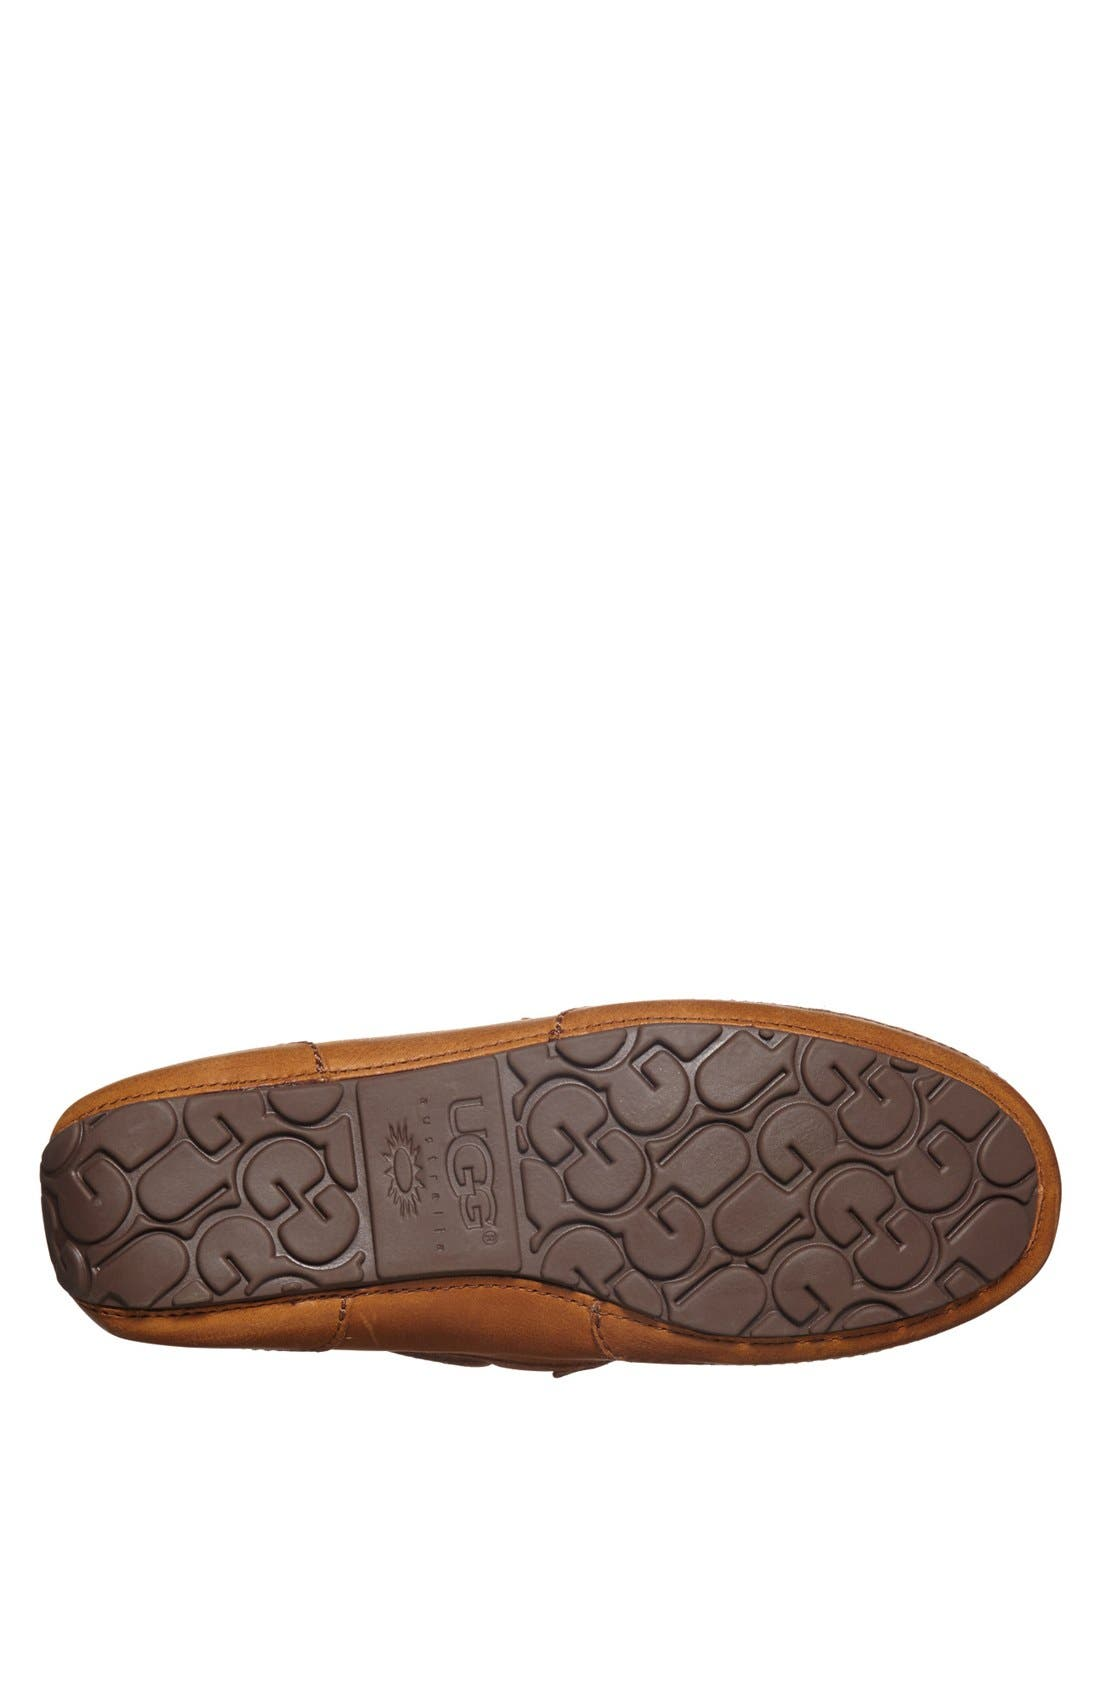 'Chester' Driving Loafer,                             Alternate thumbnail 3, color,                             Chestnut